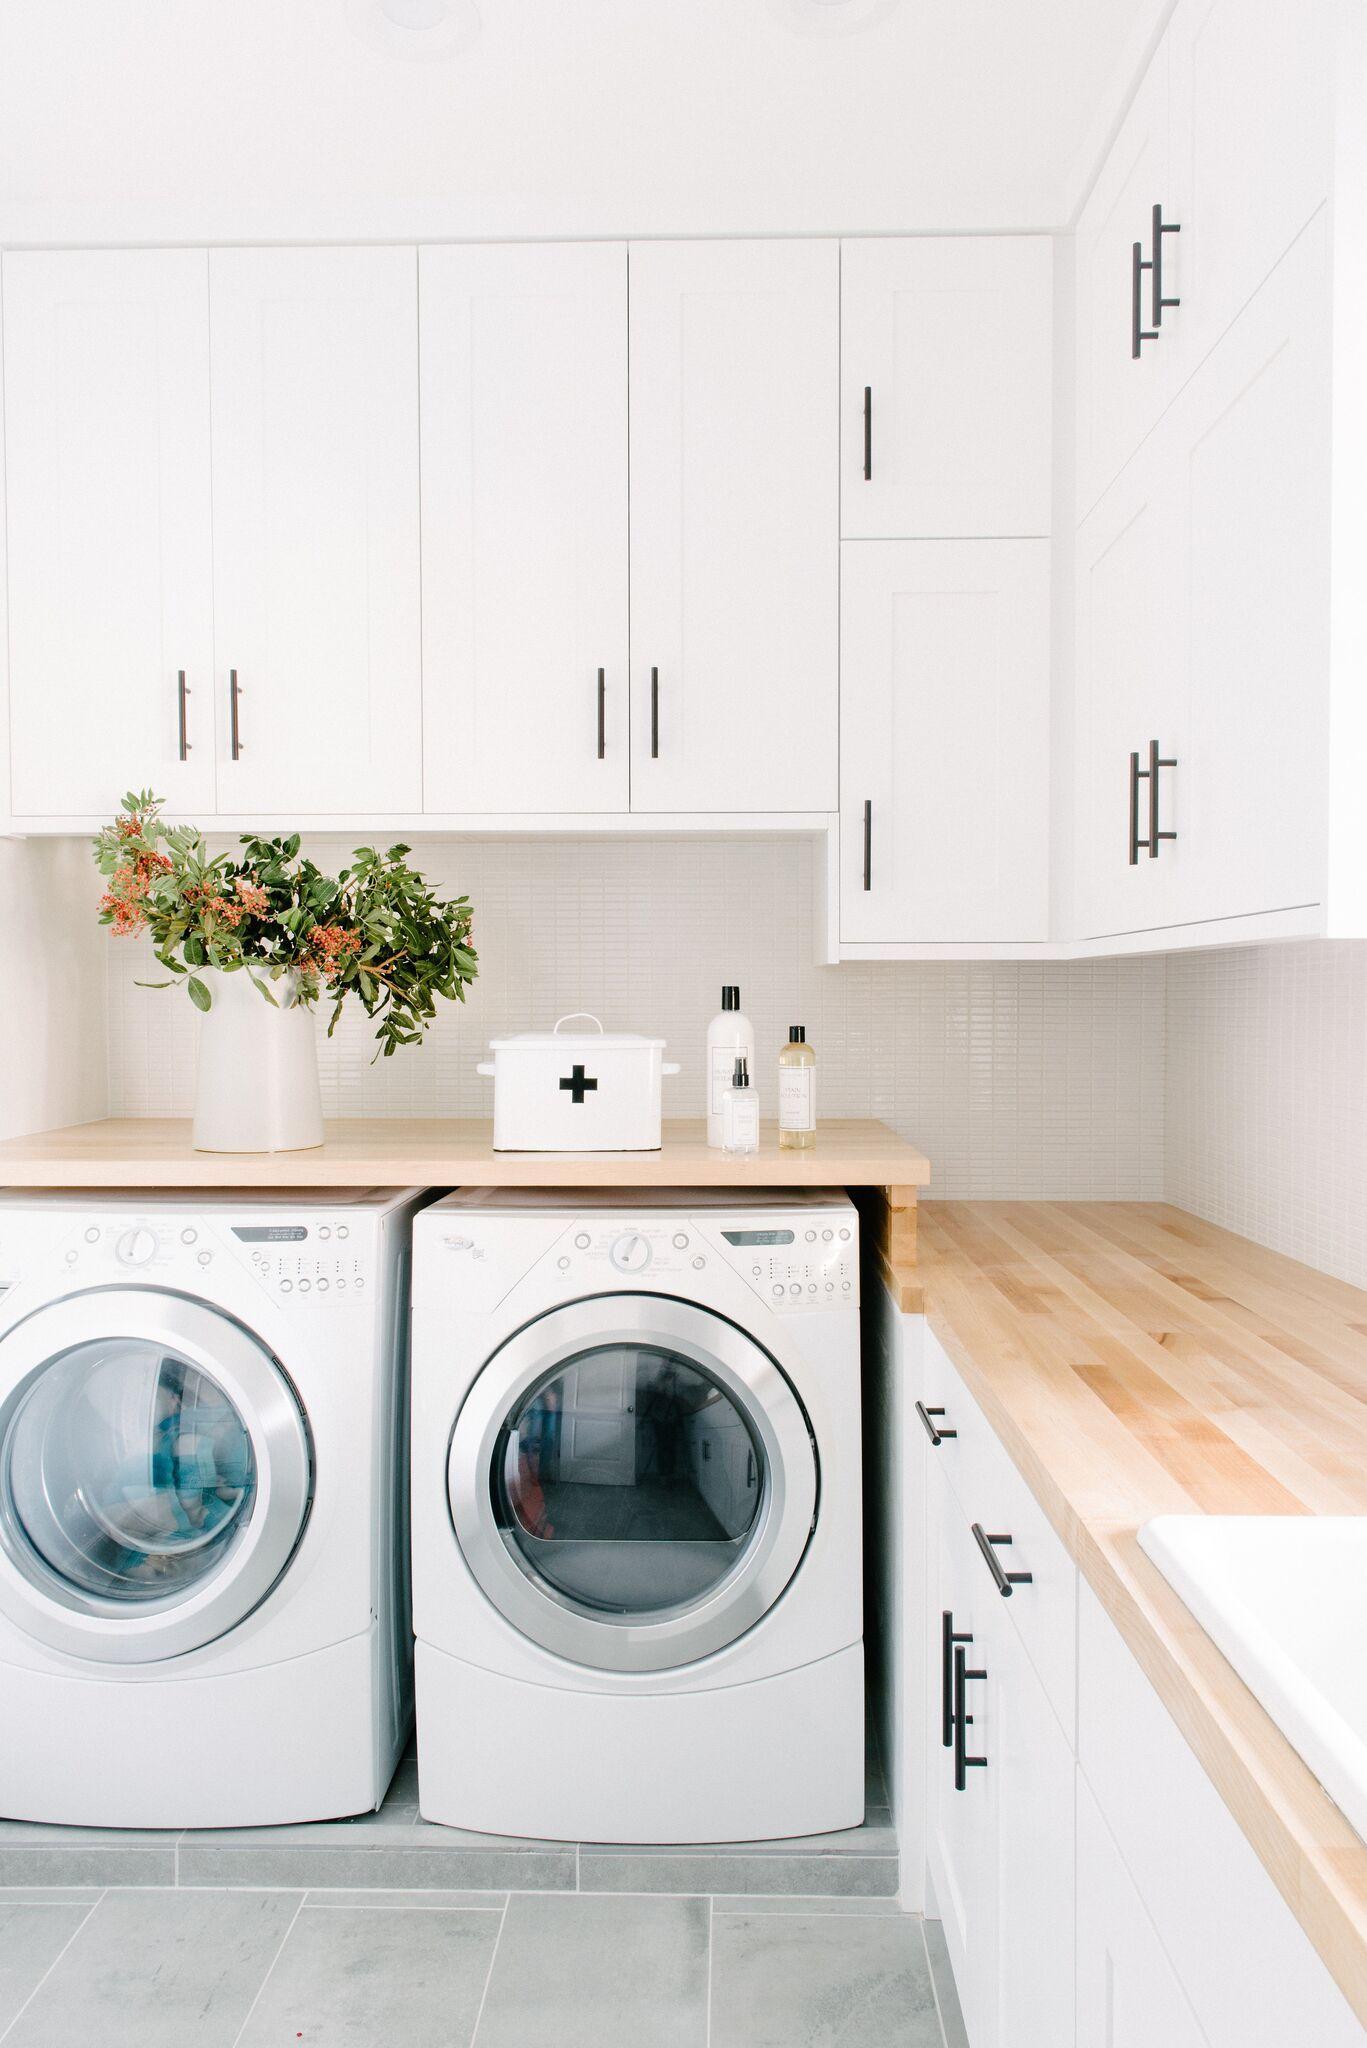 Riverbottoms Remodel Laundry Room Before After Laundry Room Inspiration Laundry Room Decor Laundry Room Design